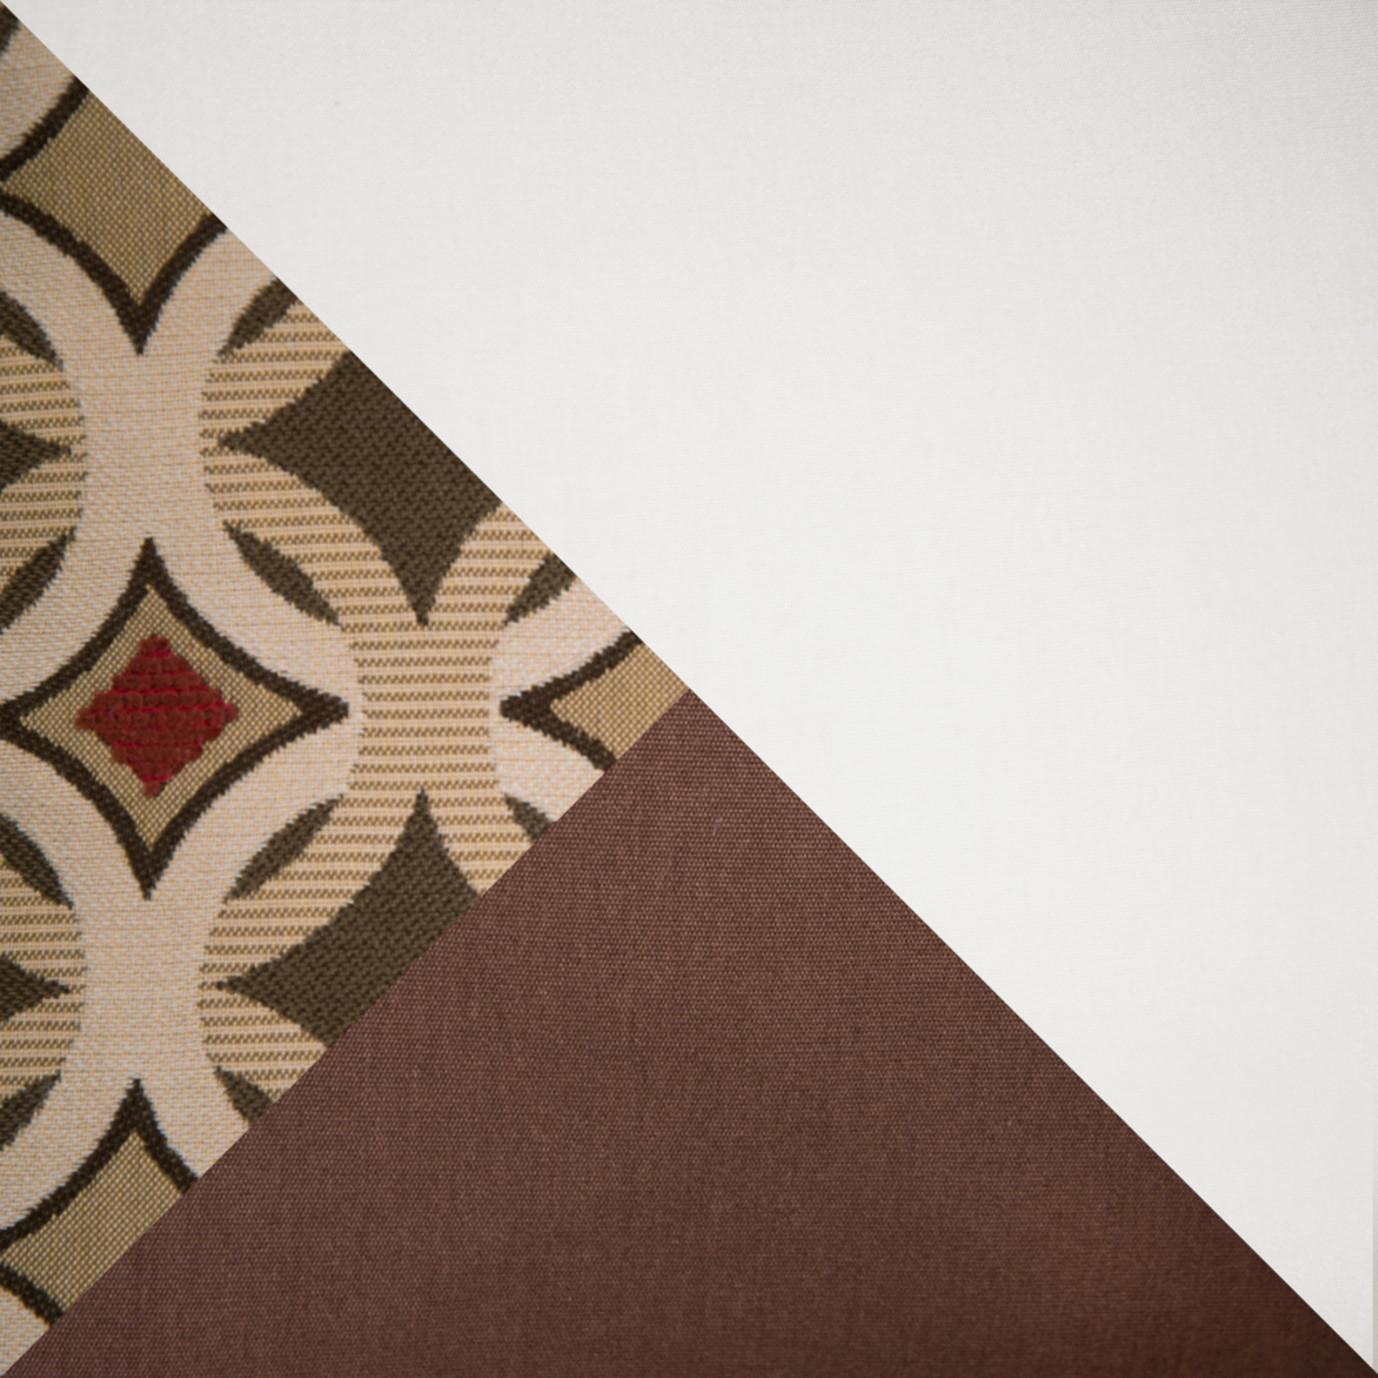 Deco™ Sofa with Coffee Table - Moroccan Cream